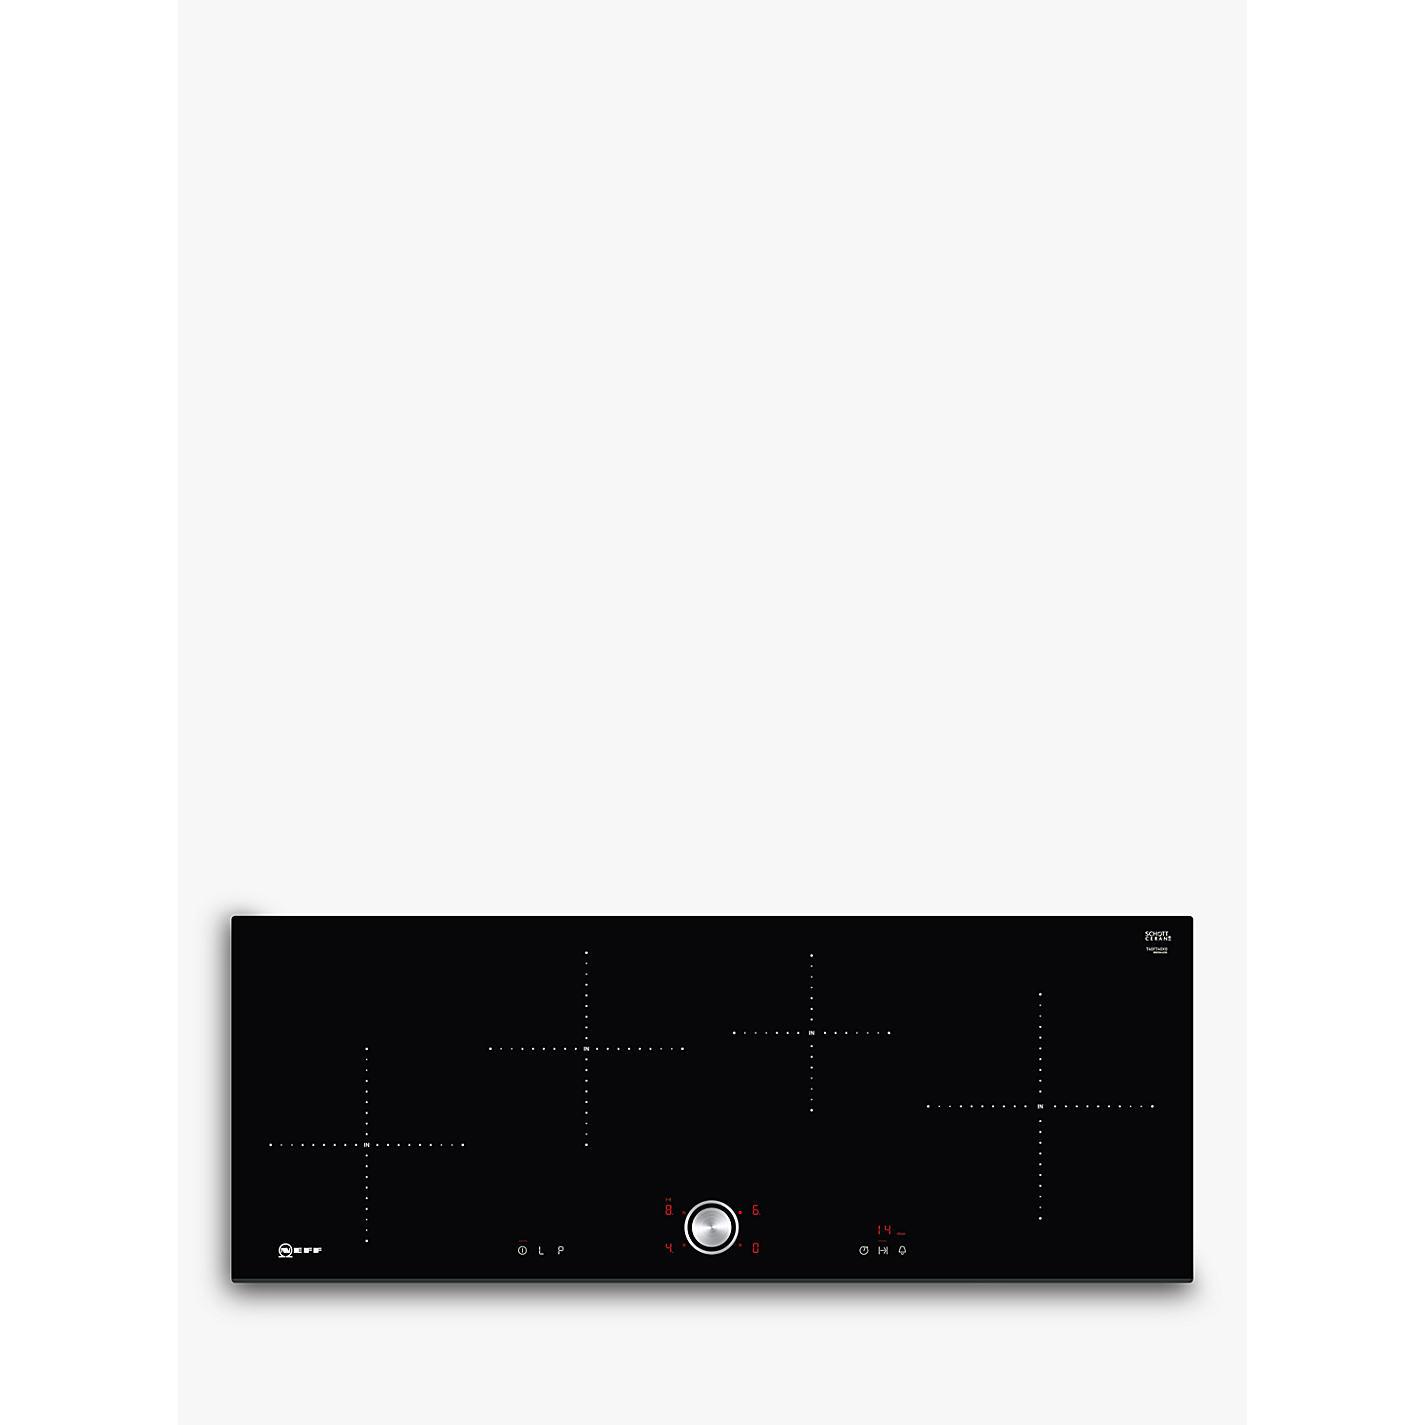 Buy Neff T40FT40X0 Induction Hob with TwistPad Black